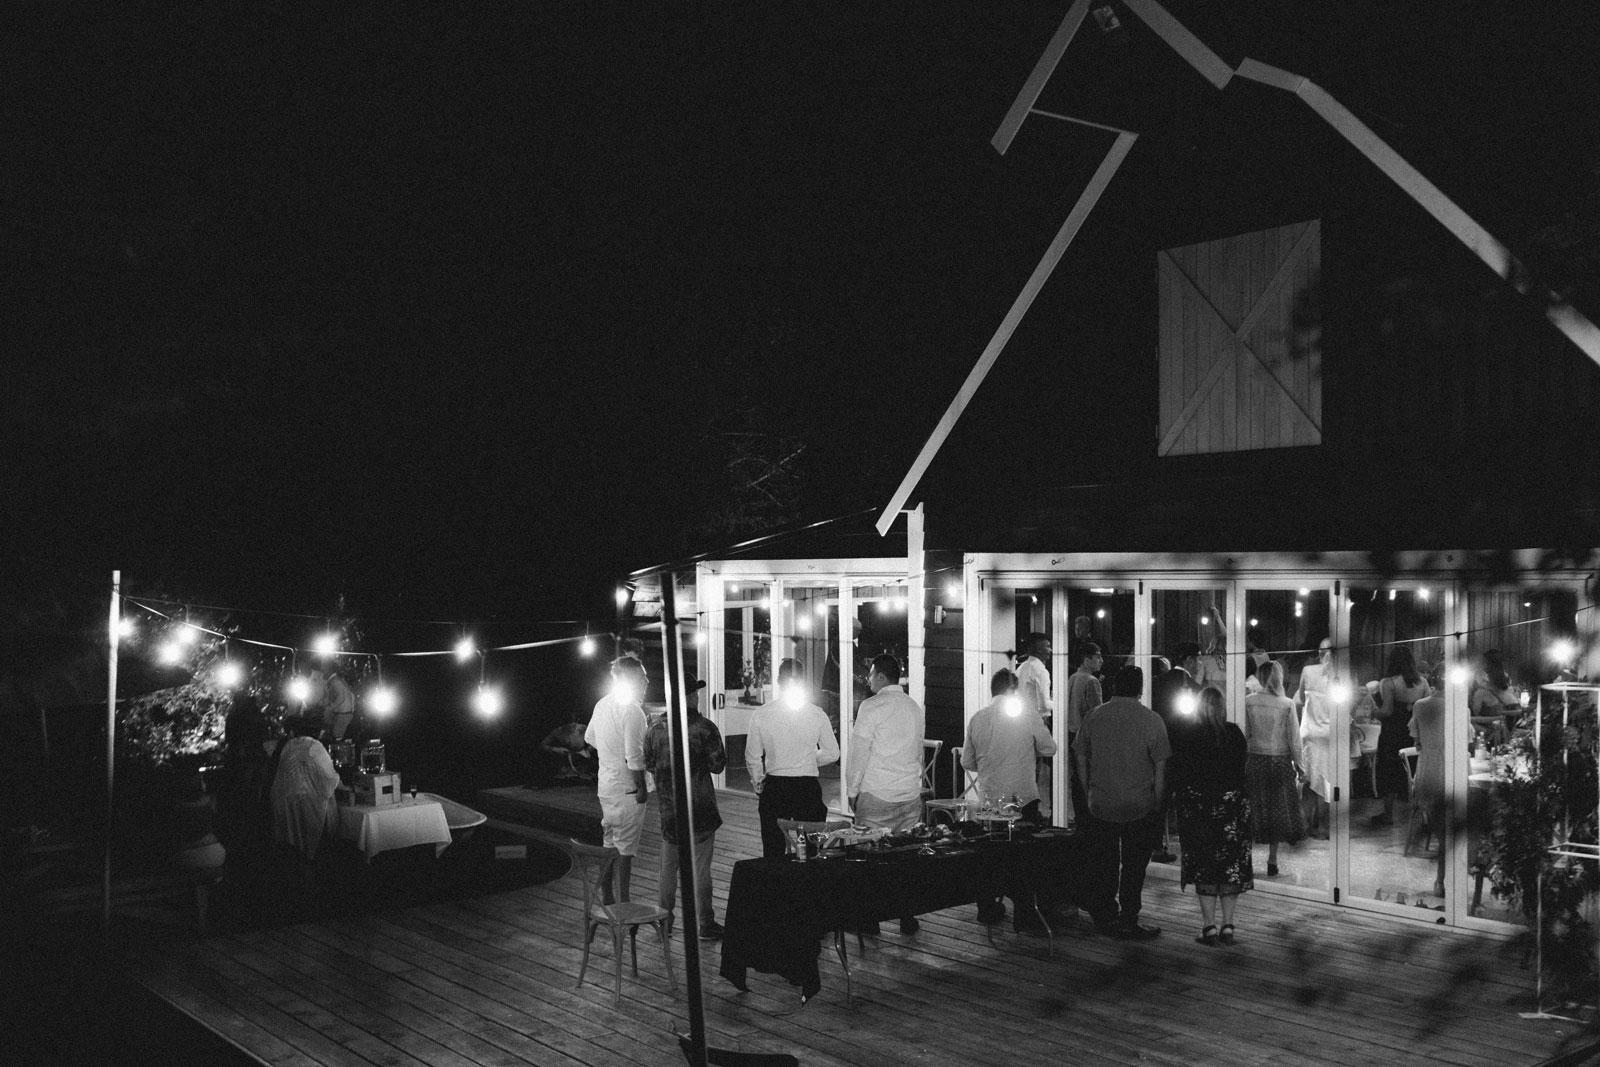 newfound-n-w-black-barn-tarawera-rotorua-wedding-photographer-1142